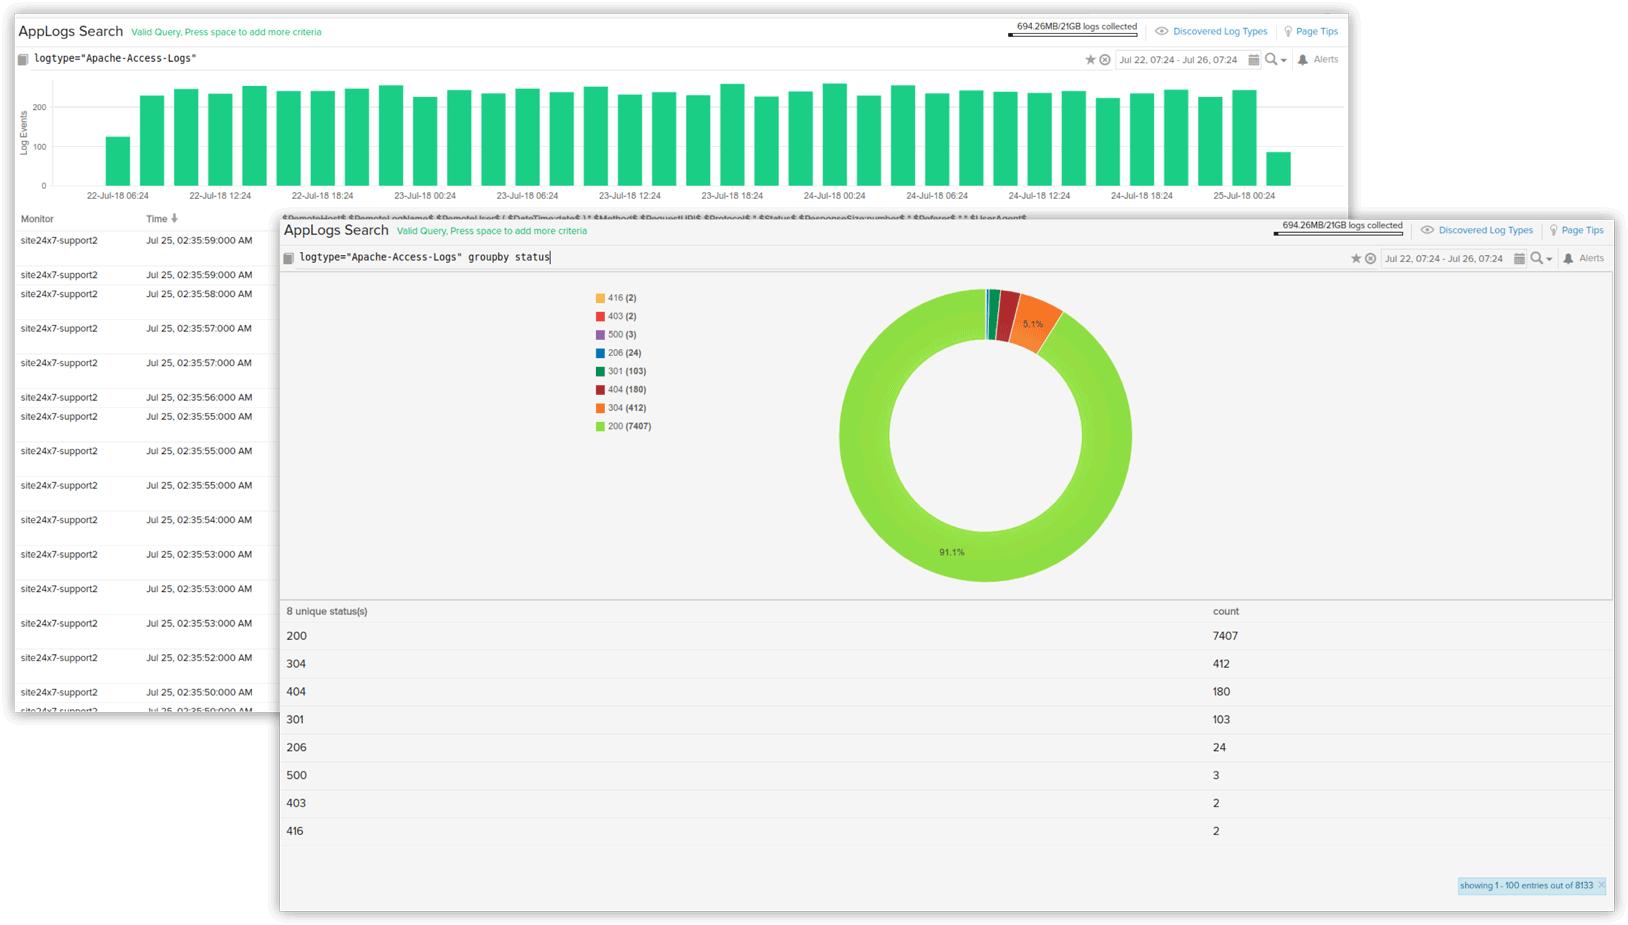 AWS Cloud monitoring - Site24x7